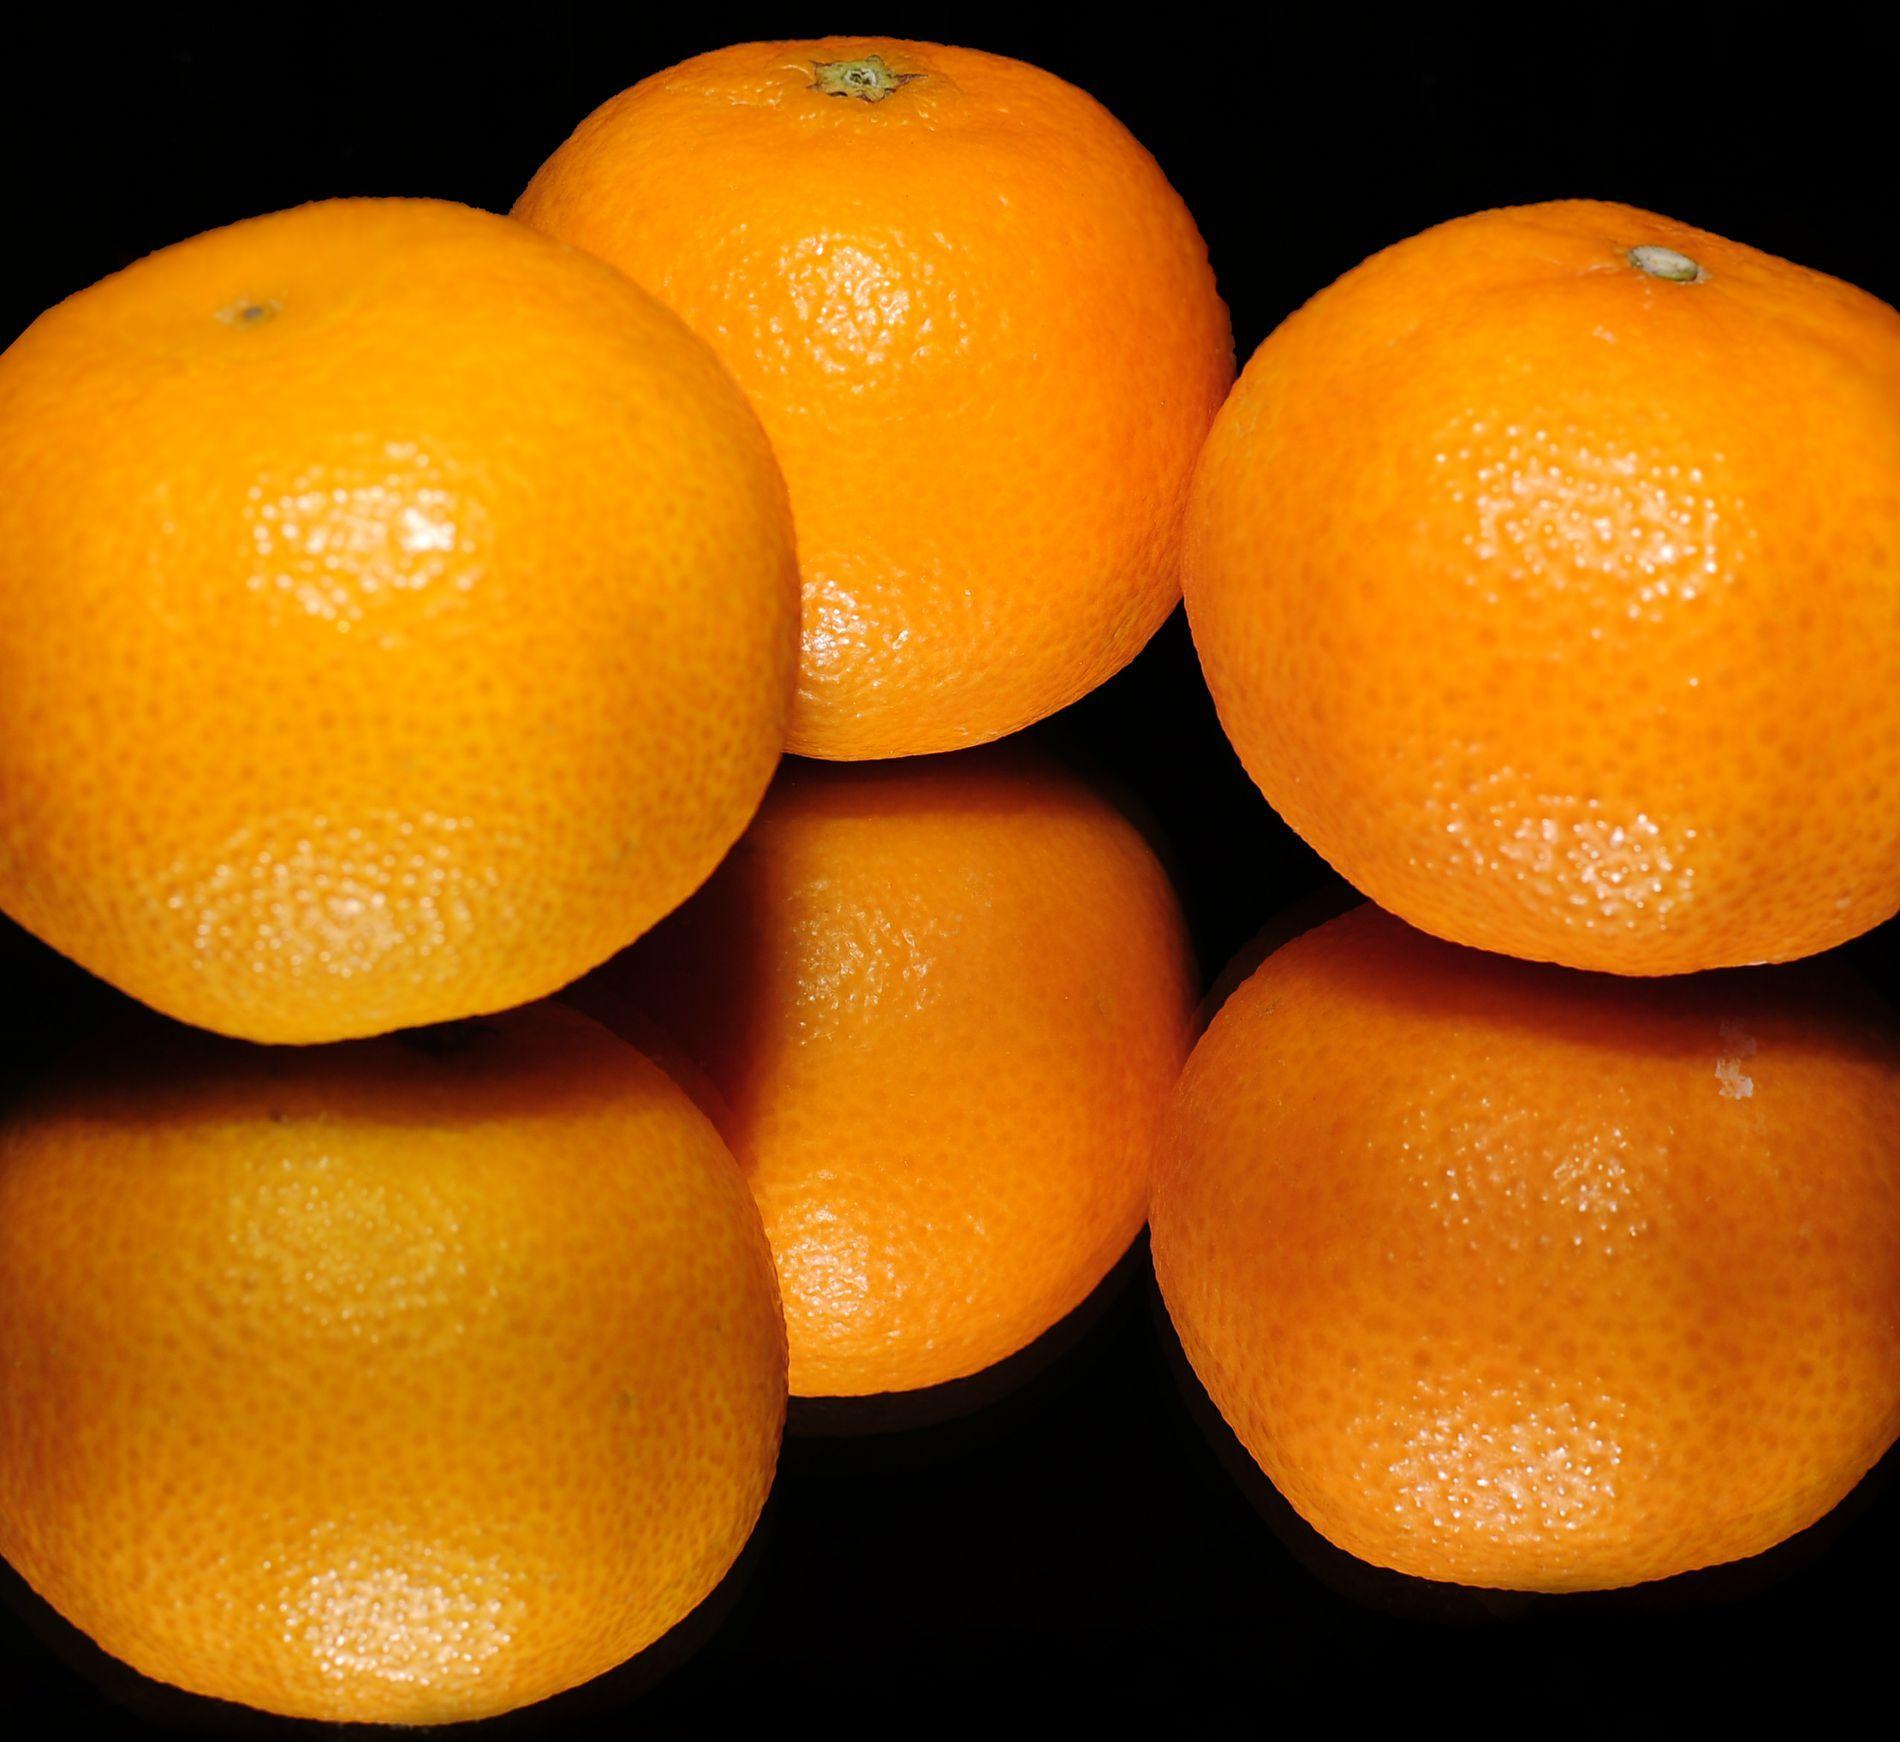 New Orange Bike Bicycle Cycle Bell MTB Road City Cute Horn Tangerine Mandarin